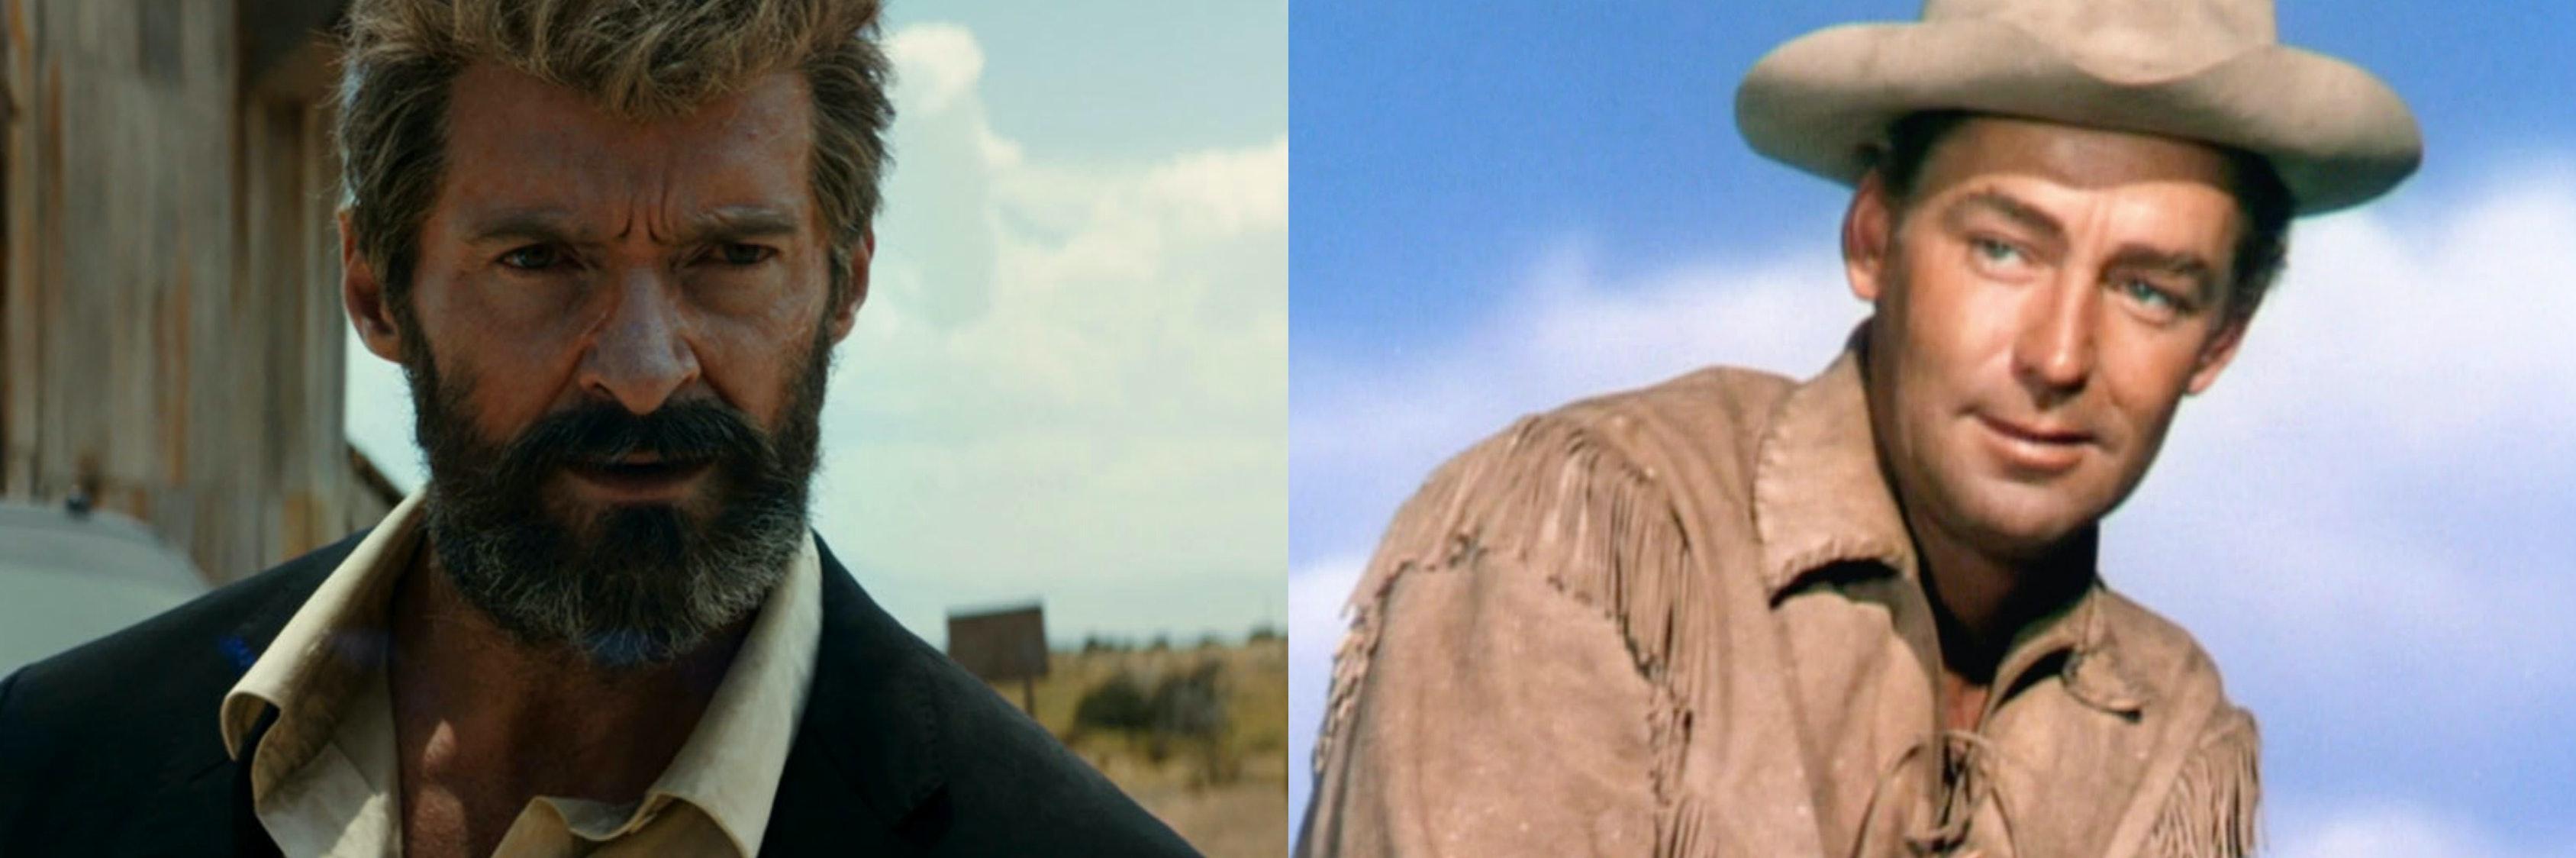 Logan and Shane